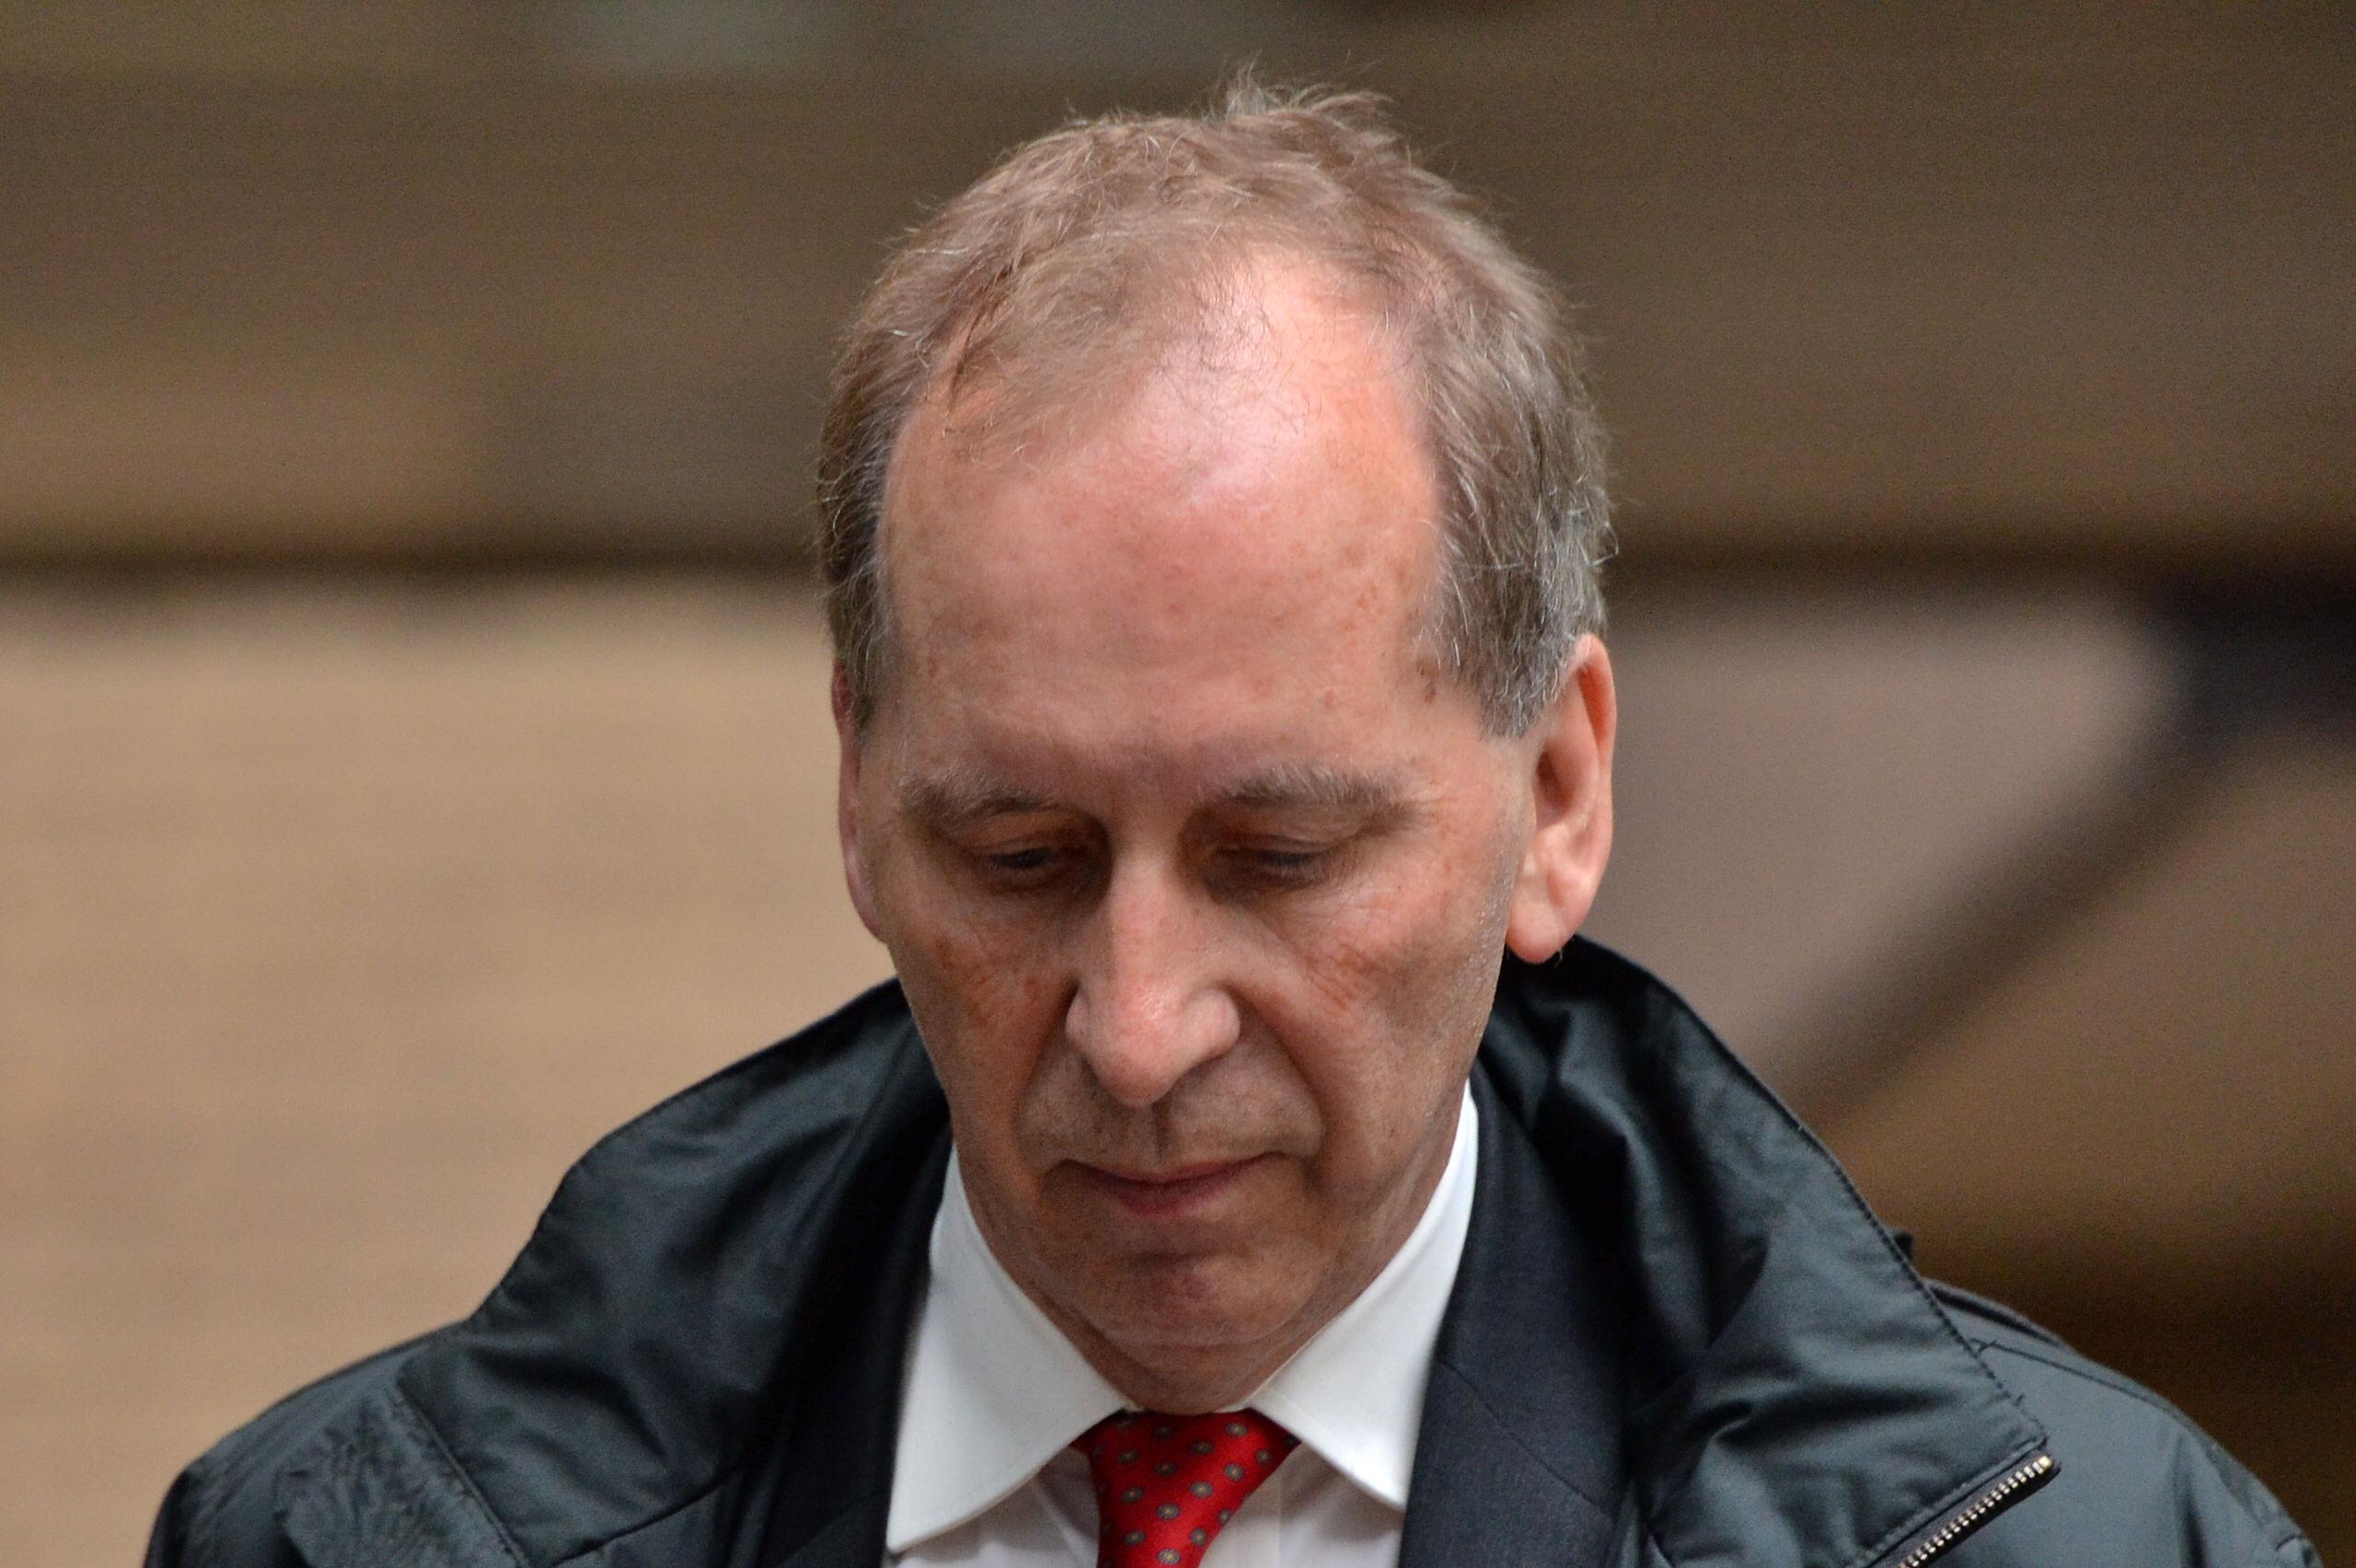 Patrick Rock leaves Southwark Crown Court in London